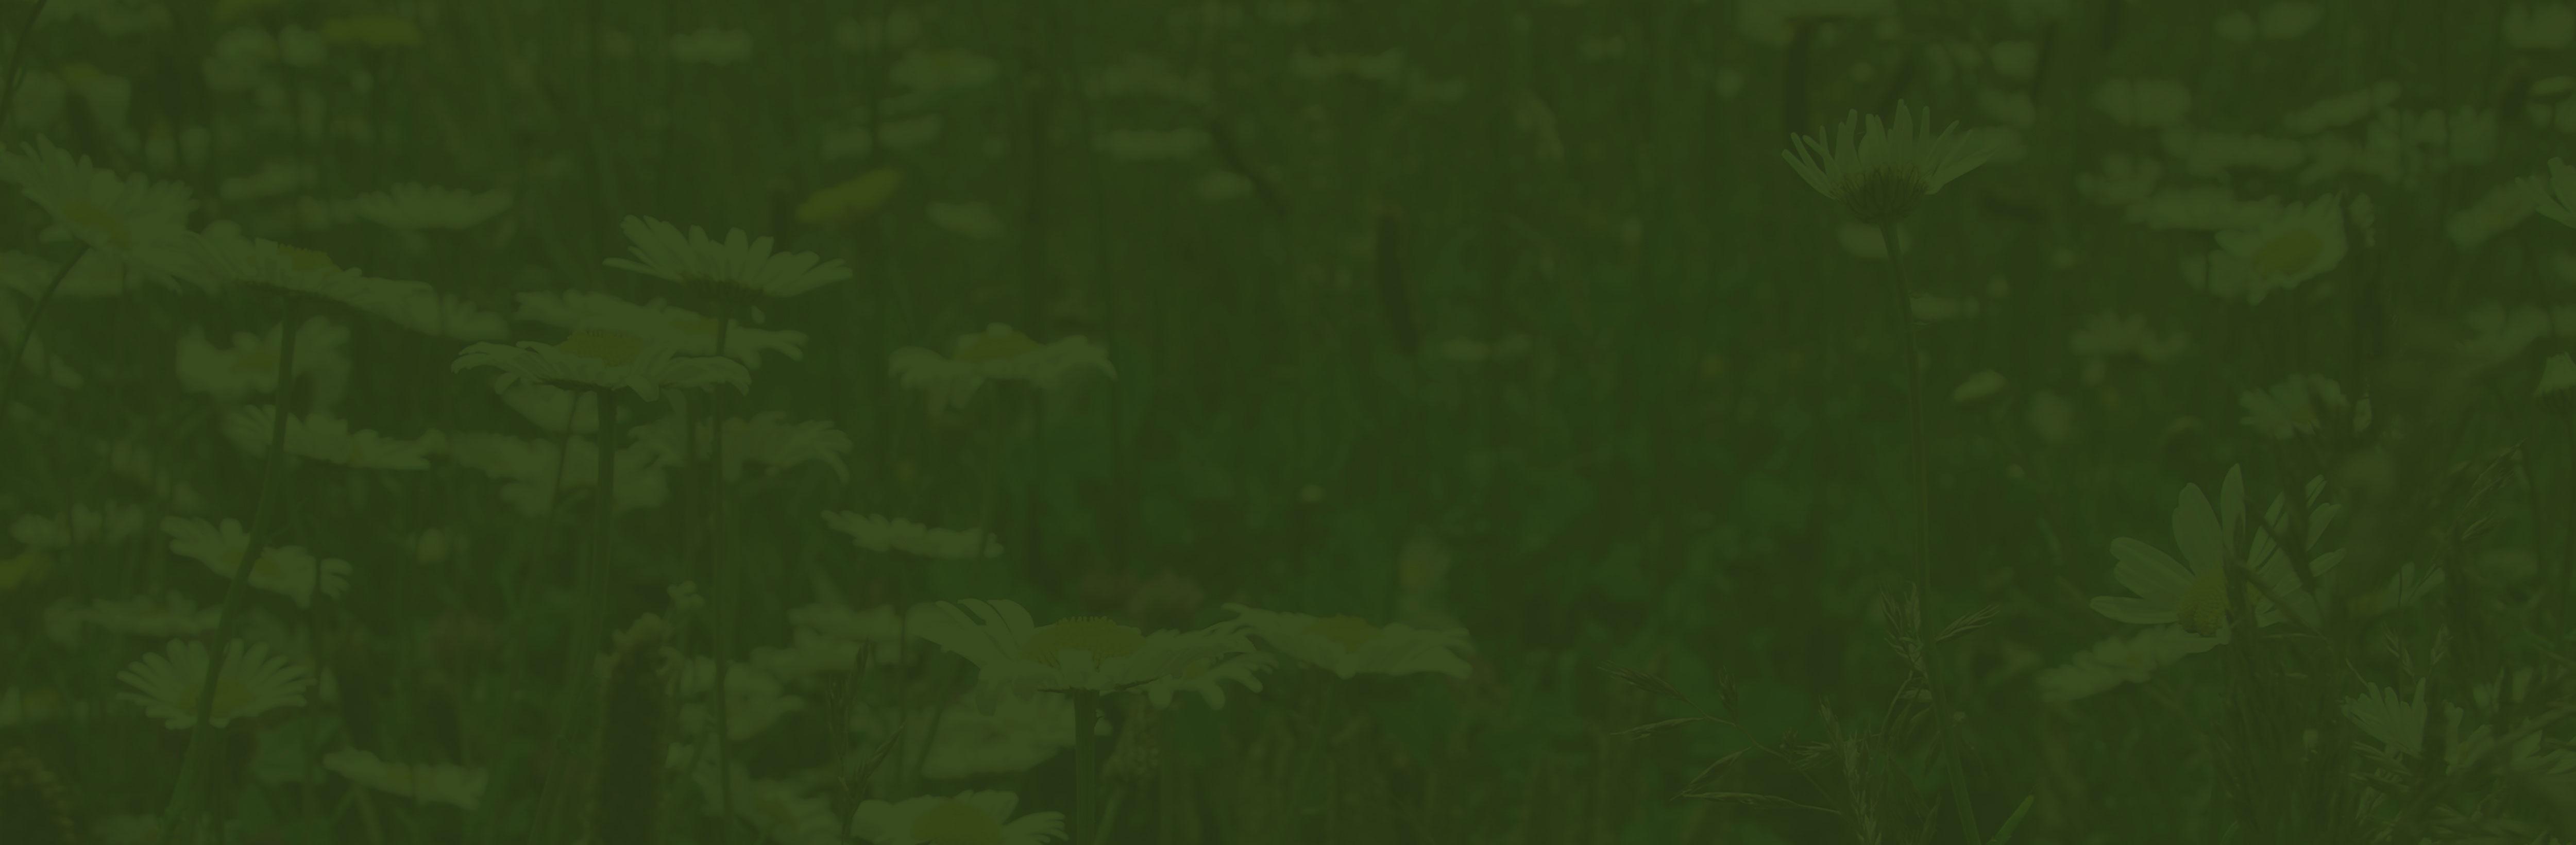 Vegetation Blankets | Sedum - MIX Type T | Roof substrates